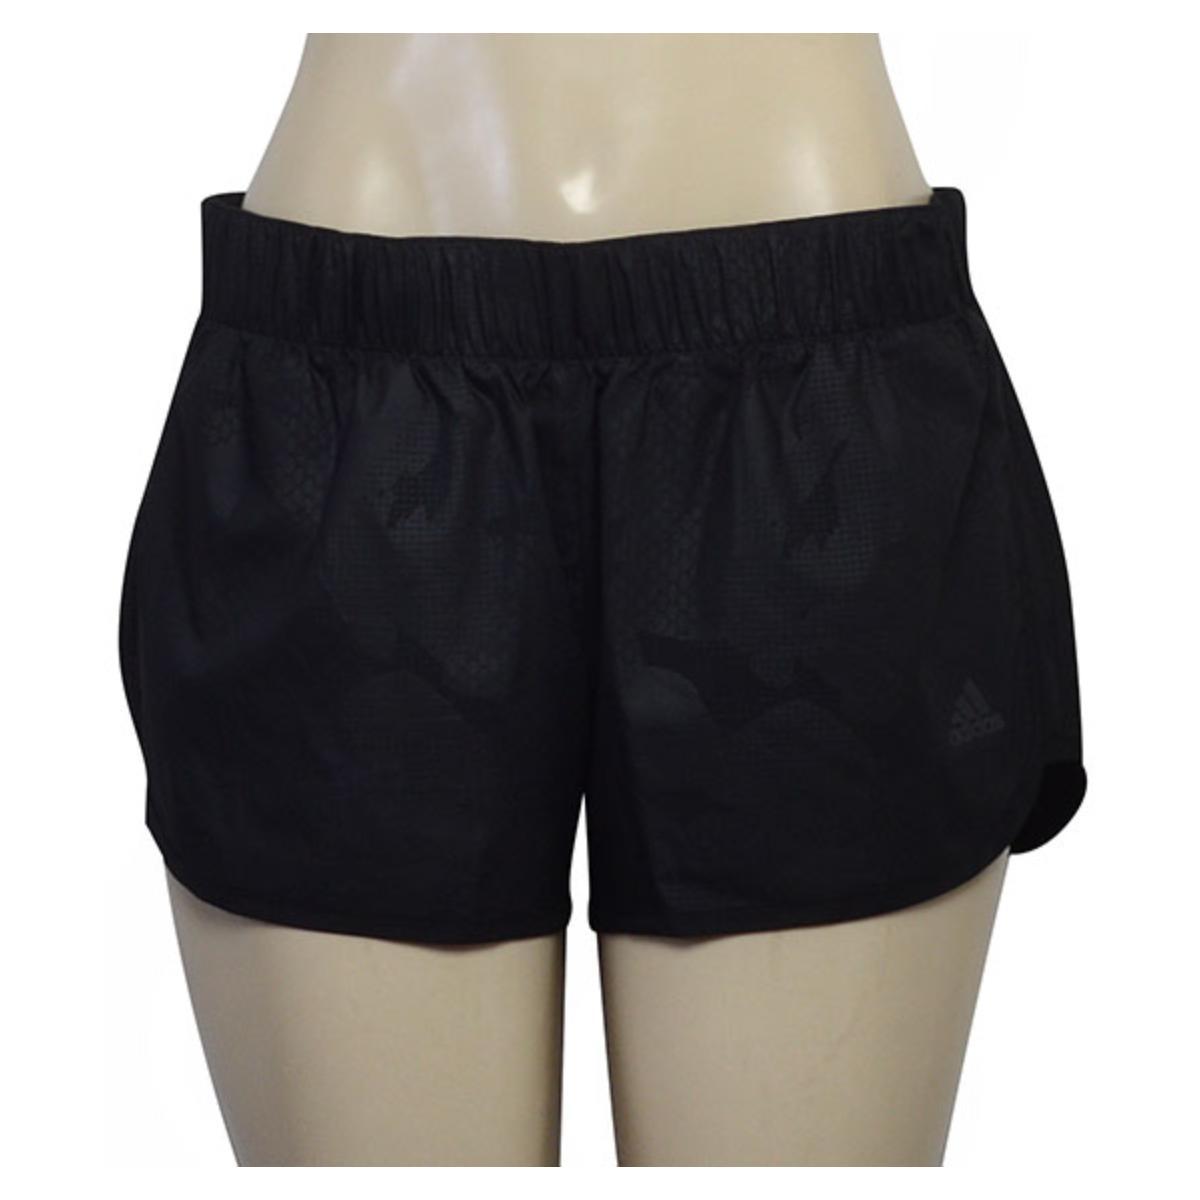 Short Feminino Adidas Dm2815 M10 Shor Preto